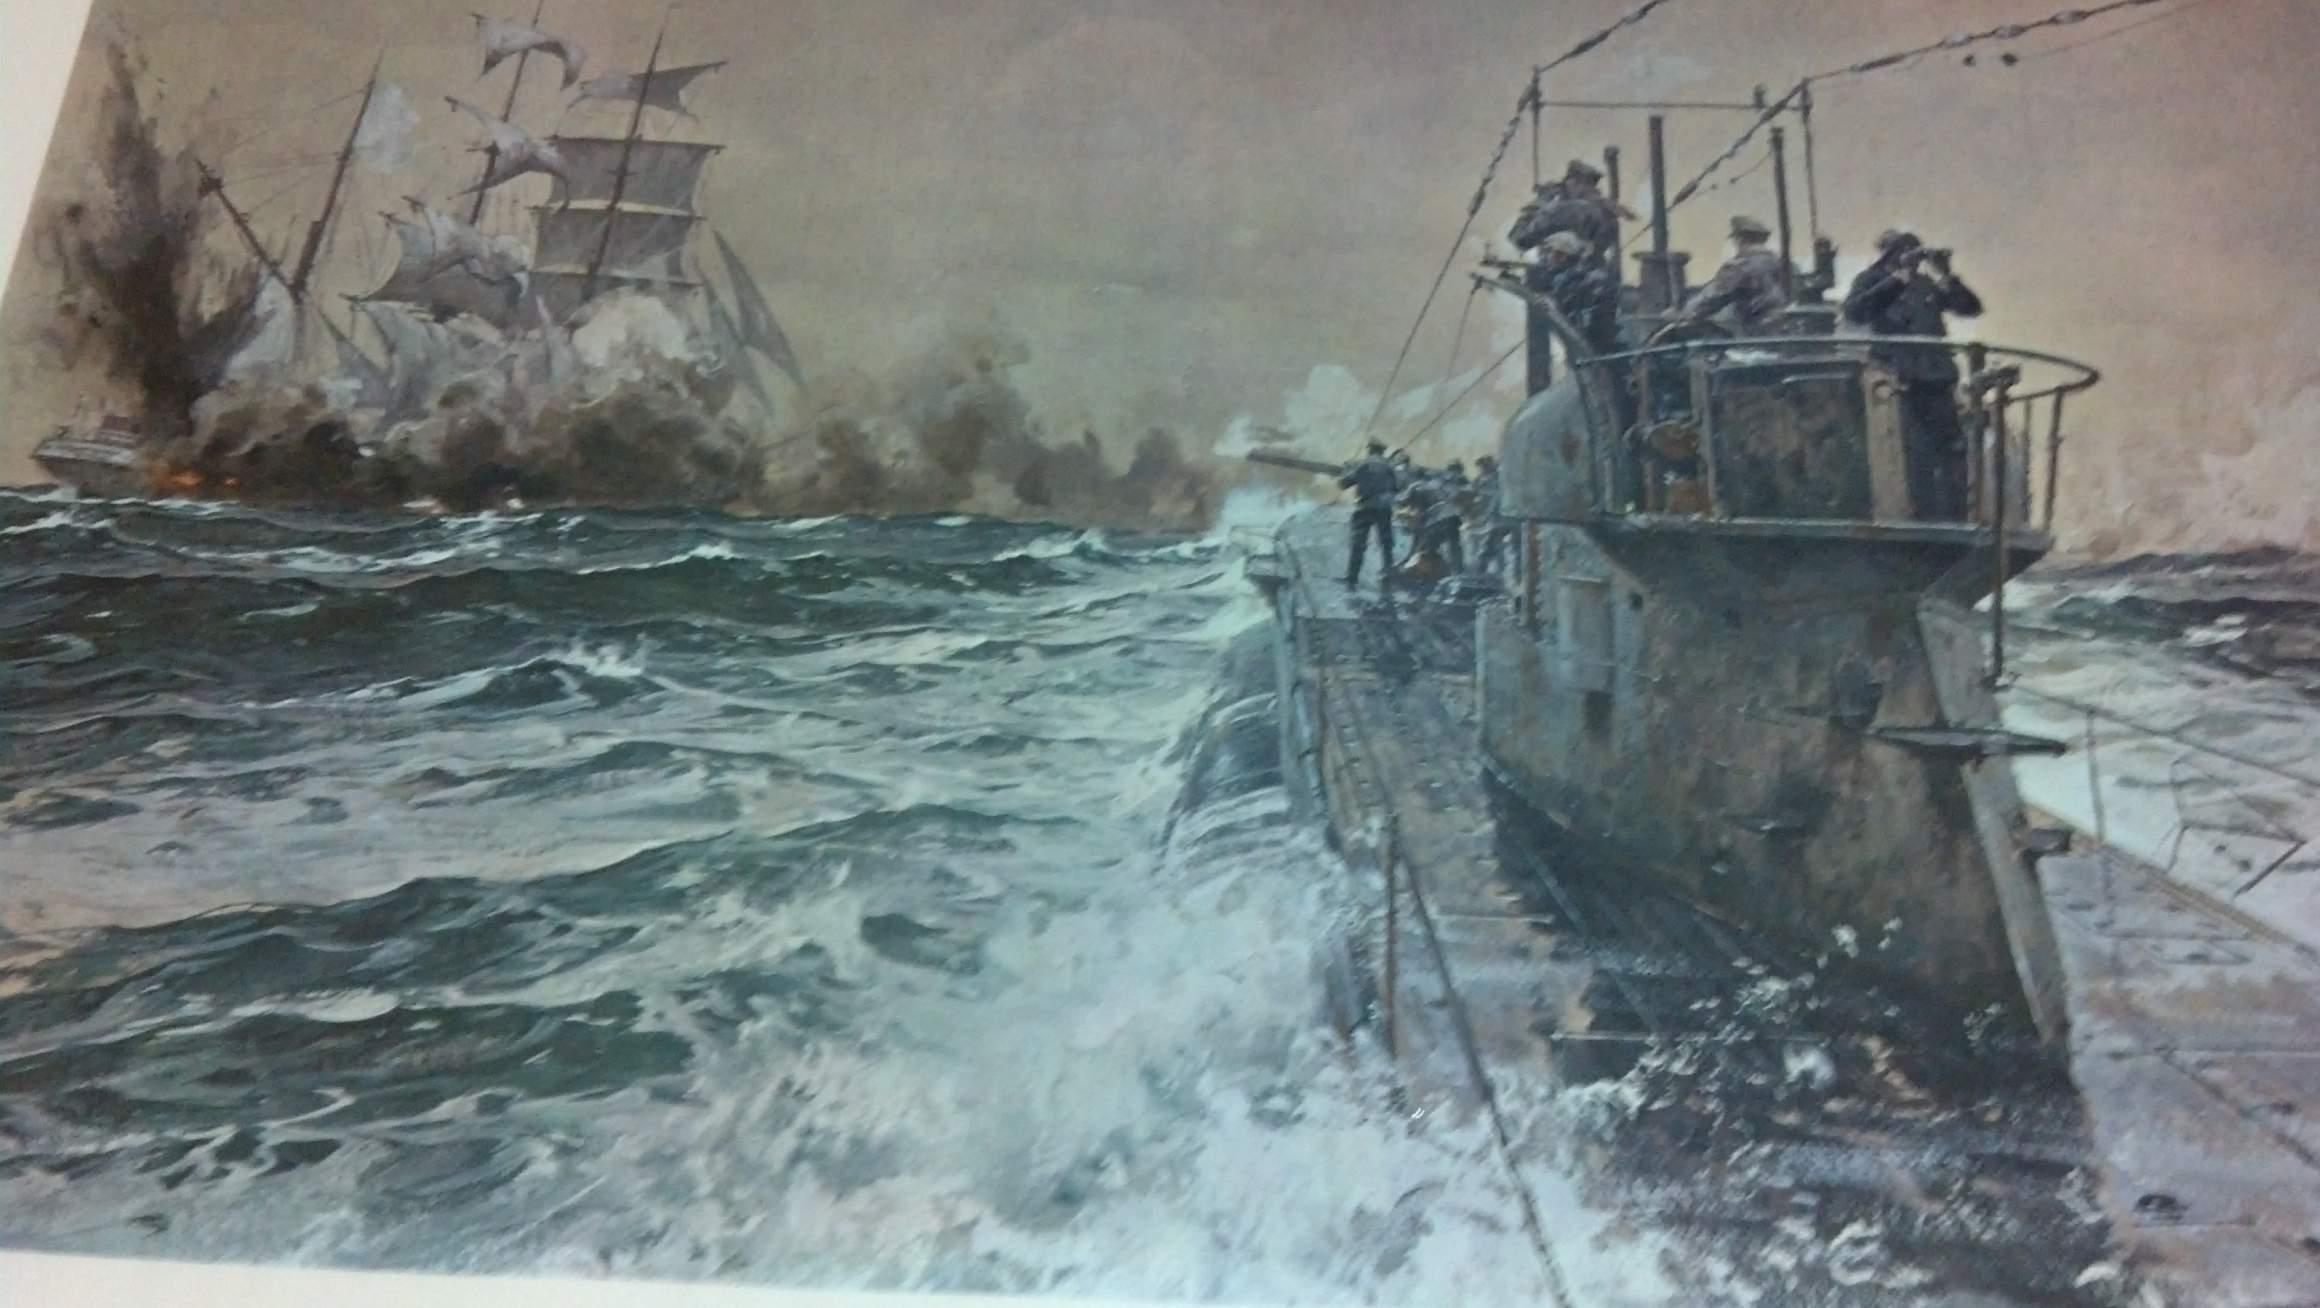 Uboats of WW1  forcespostalhistorysocietyorguk